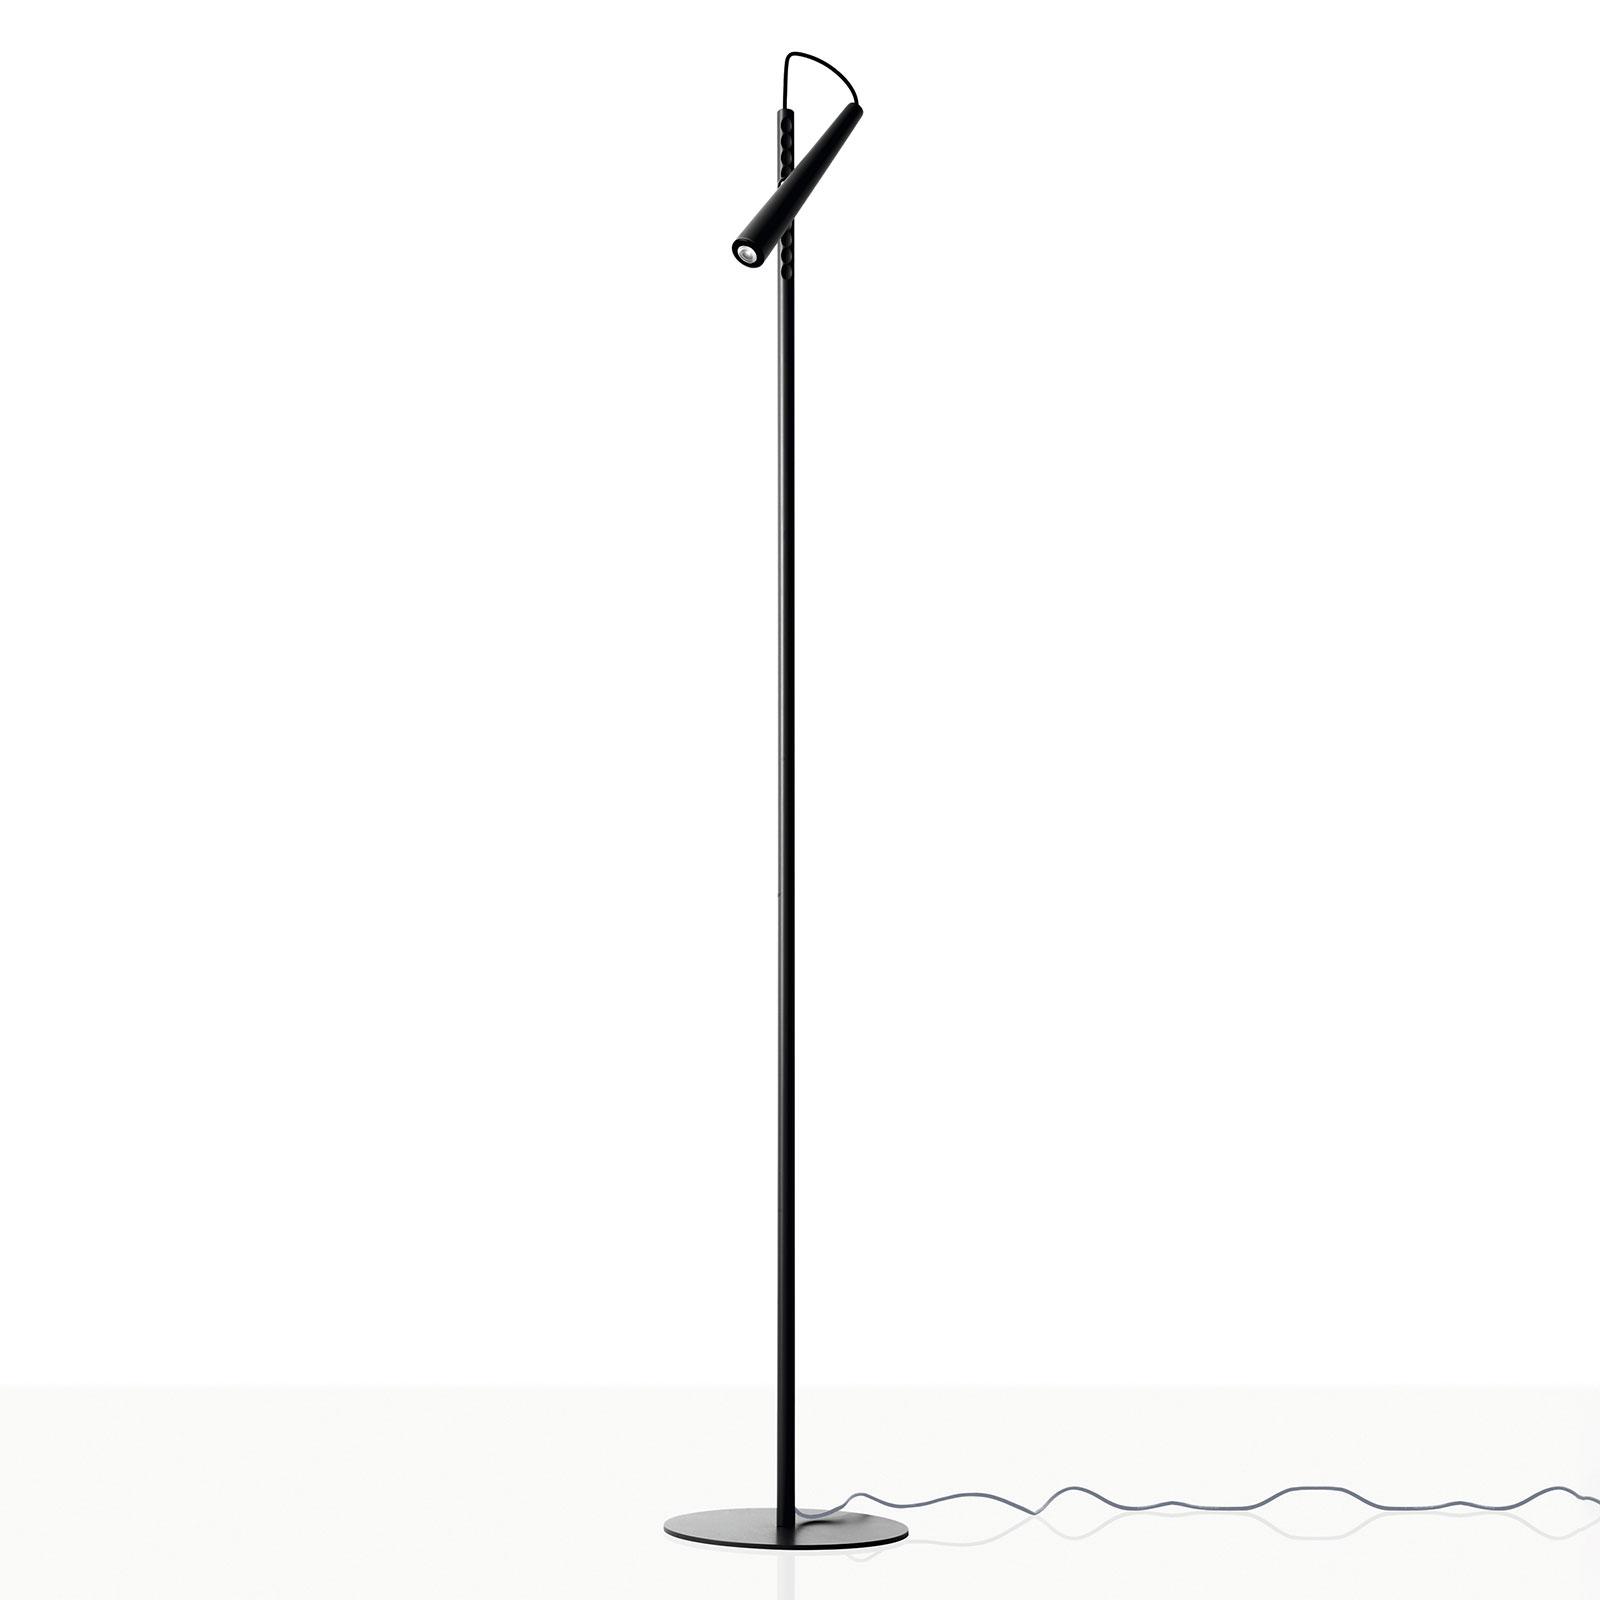 Foscarini Magneto LED-gulvlampe, svart